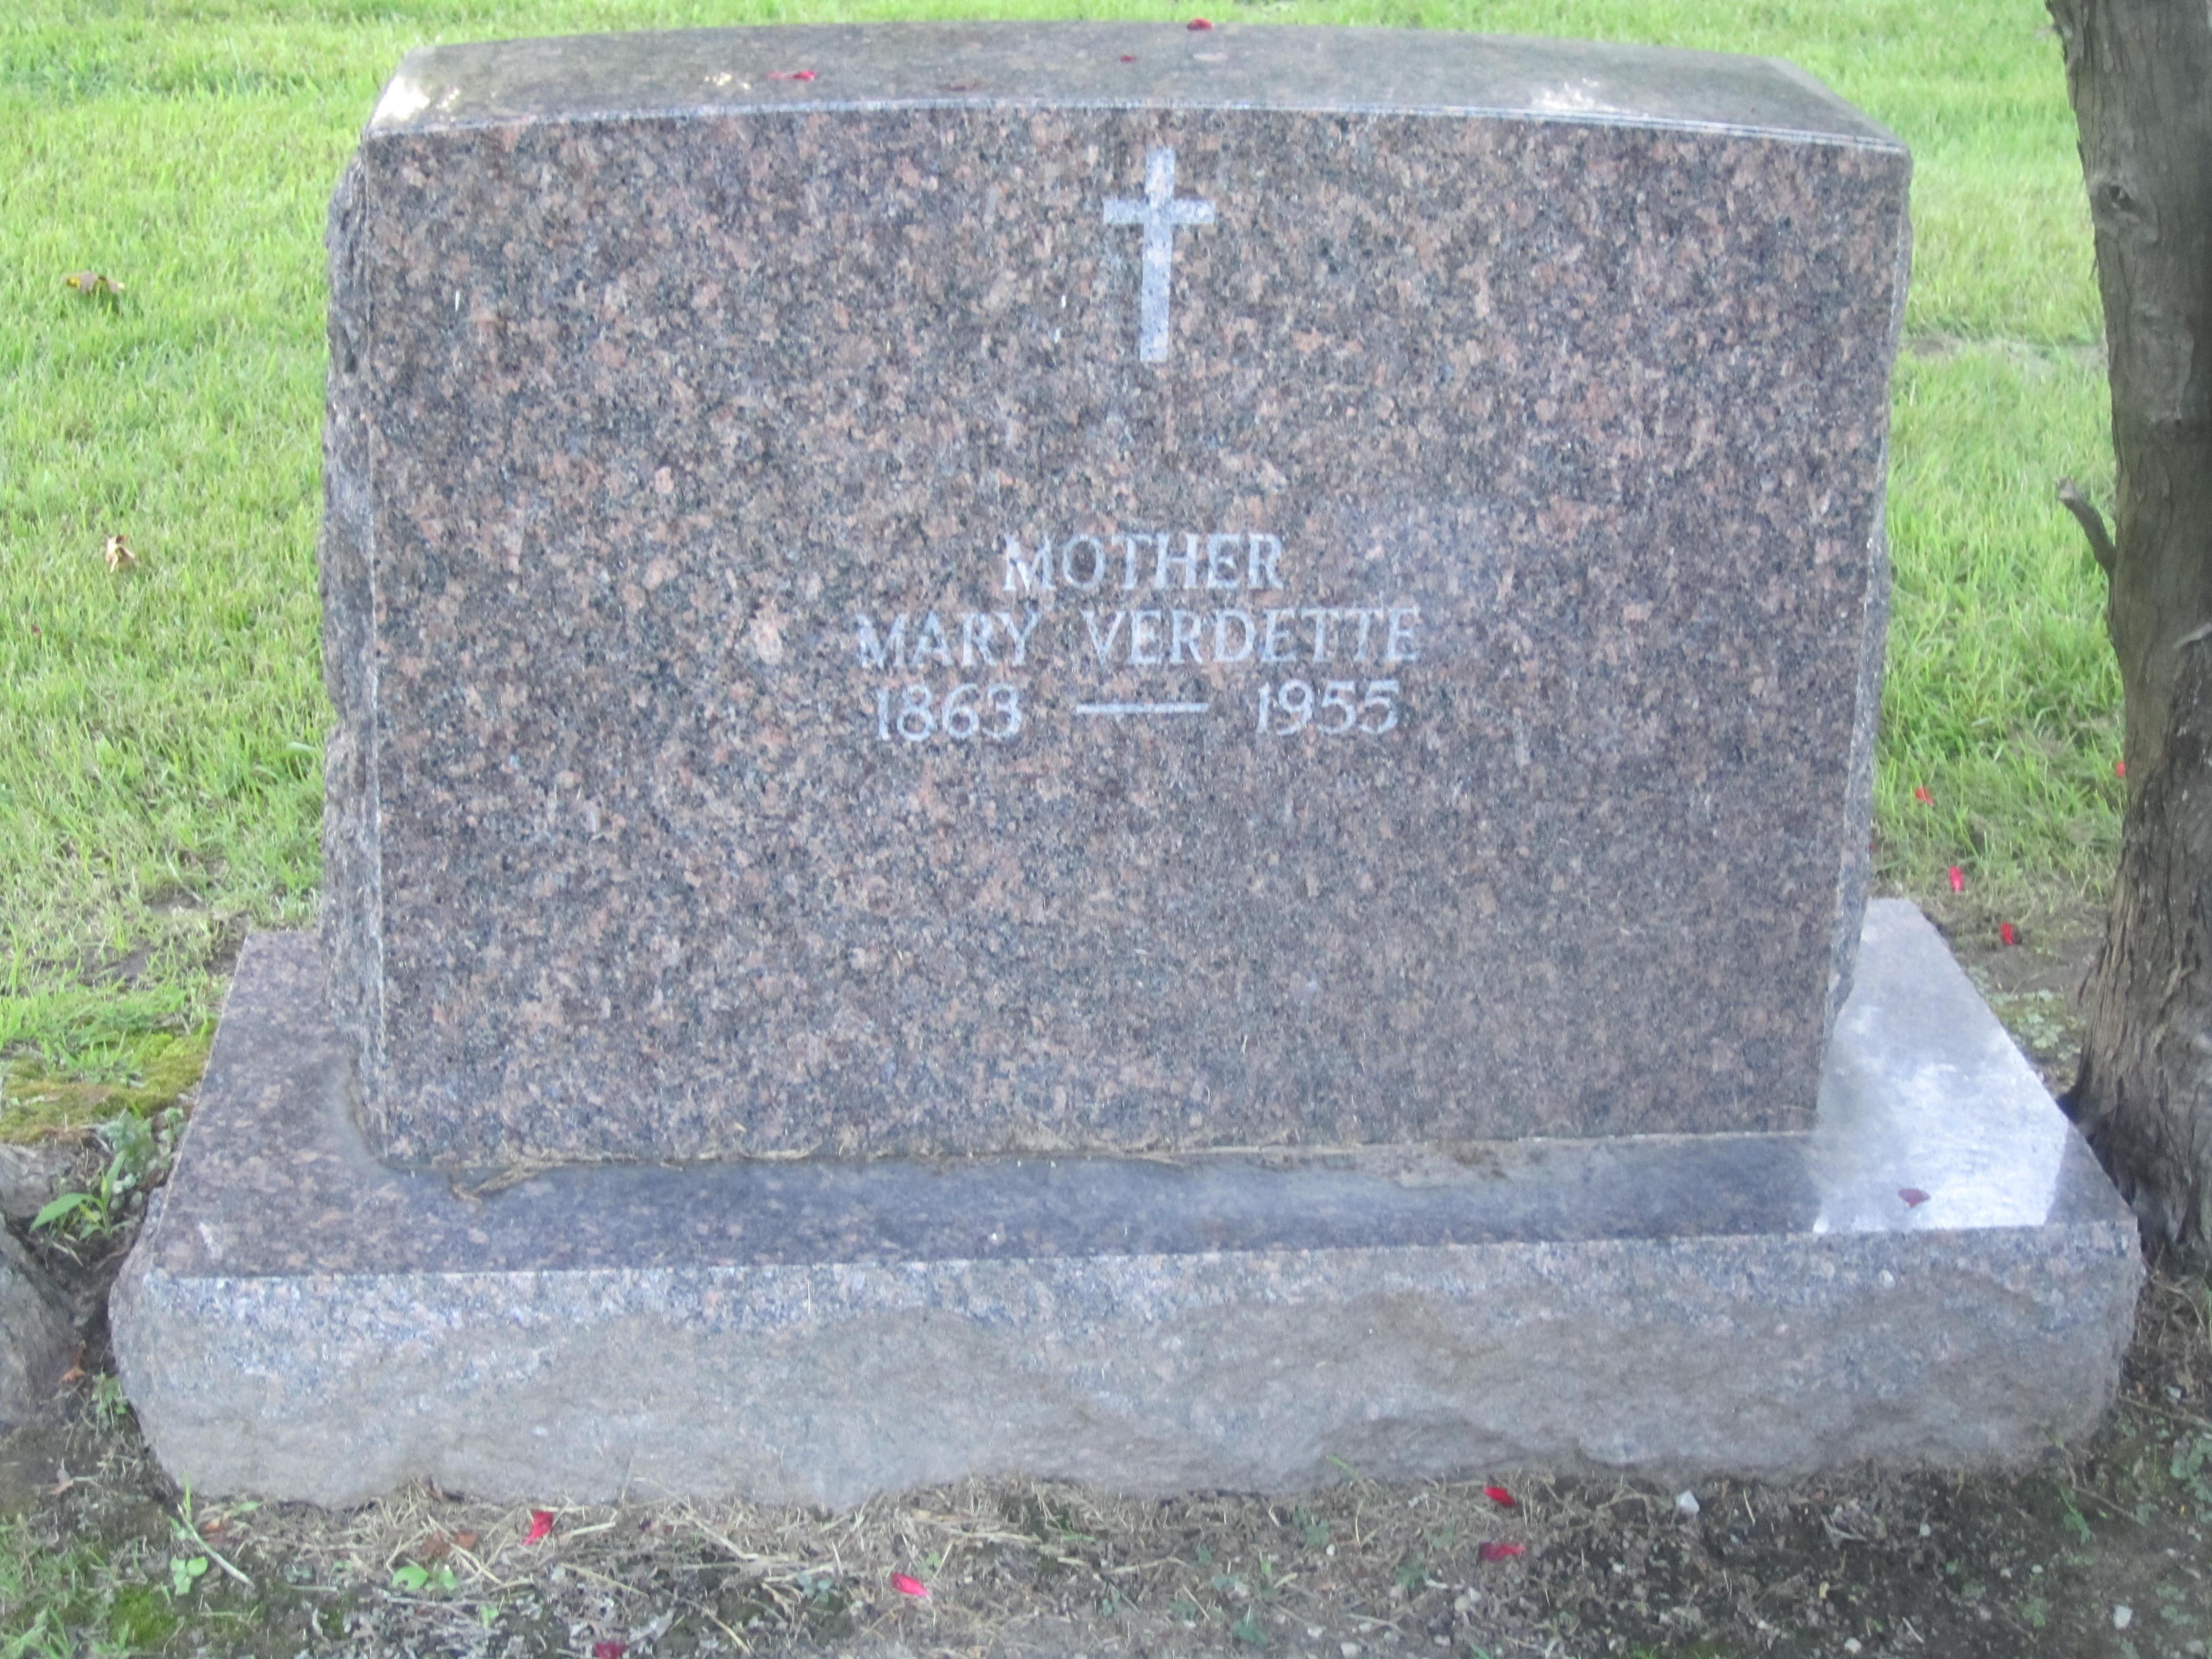 Mary Verdette-Stieger (1863-1955)